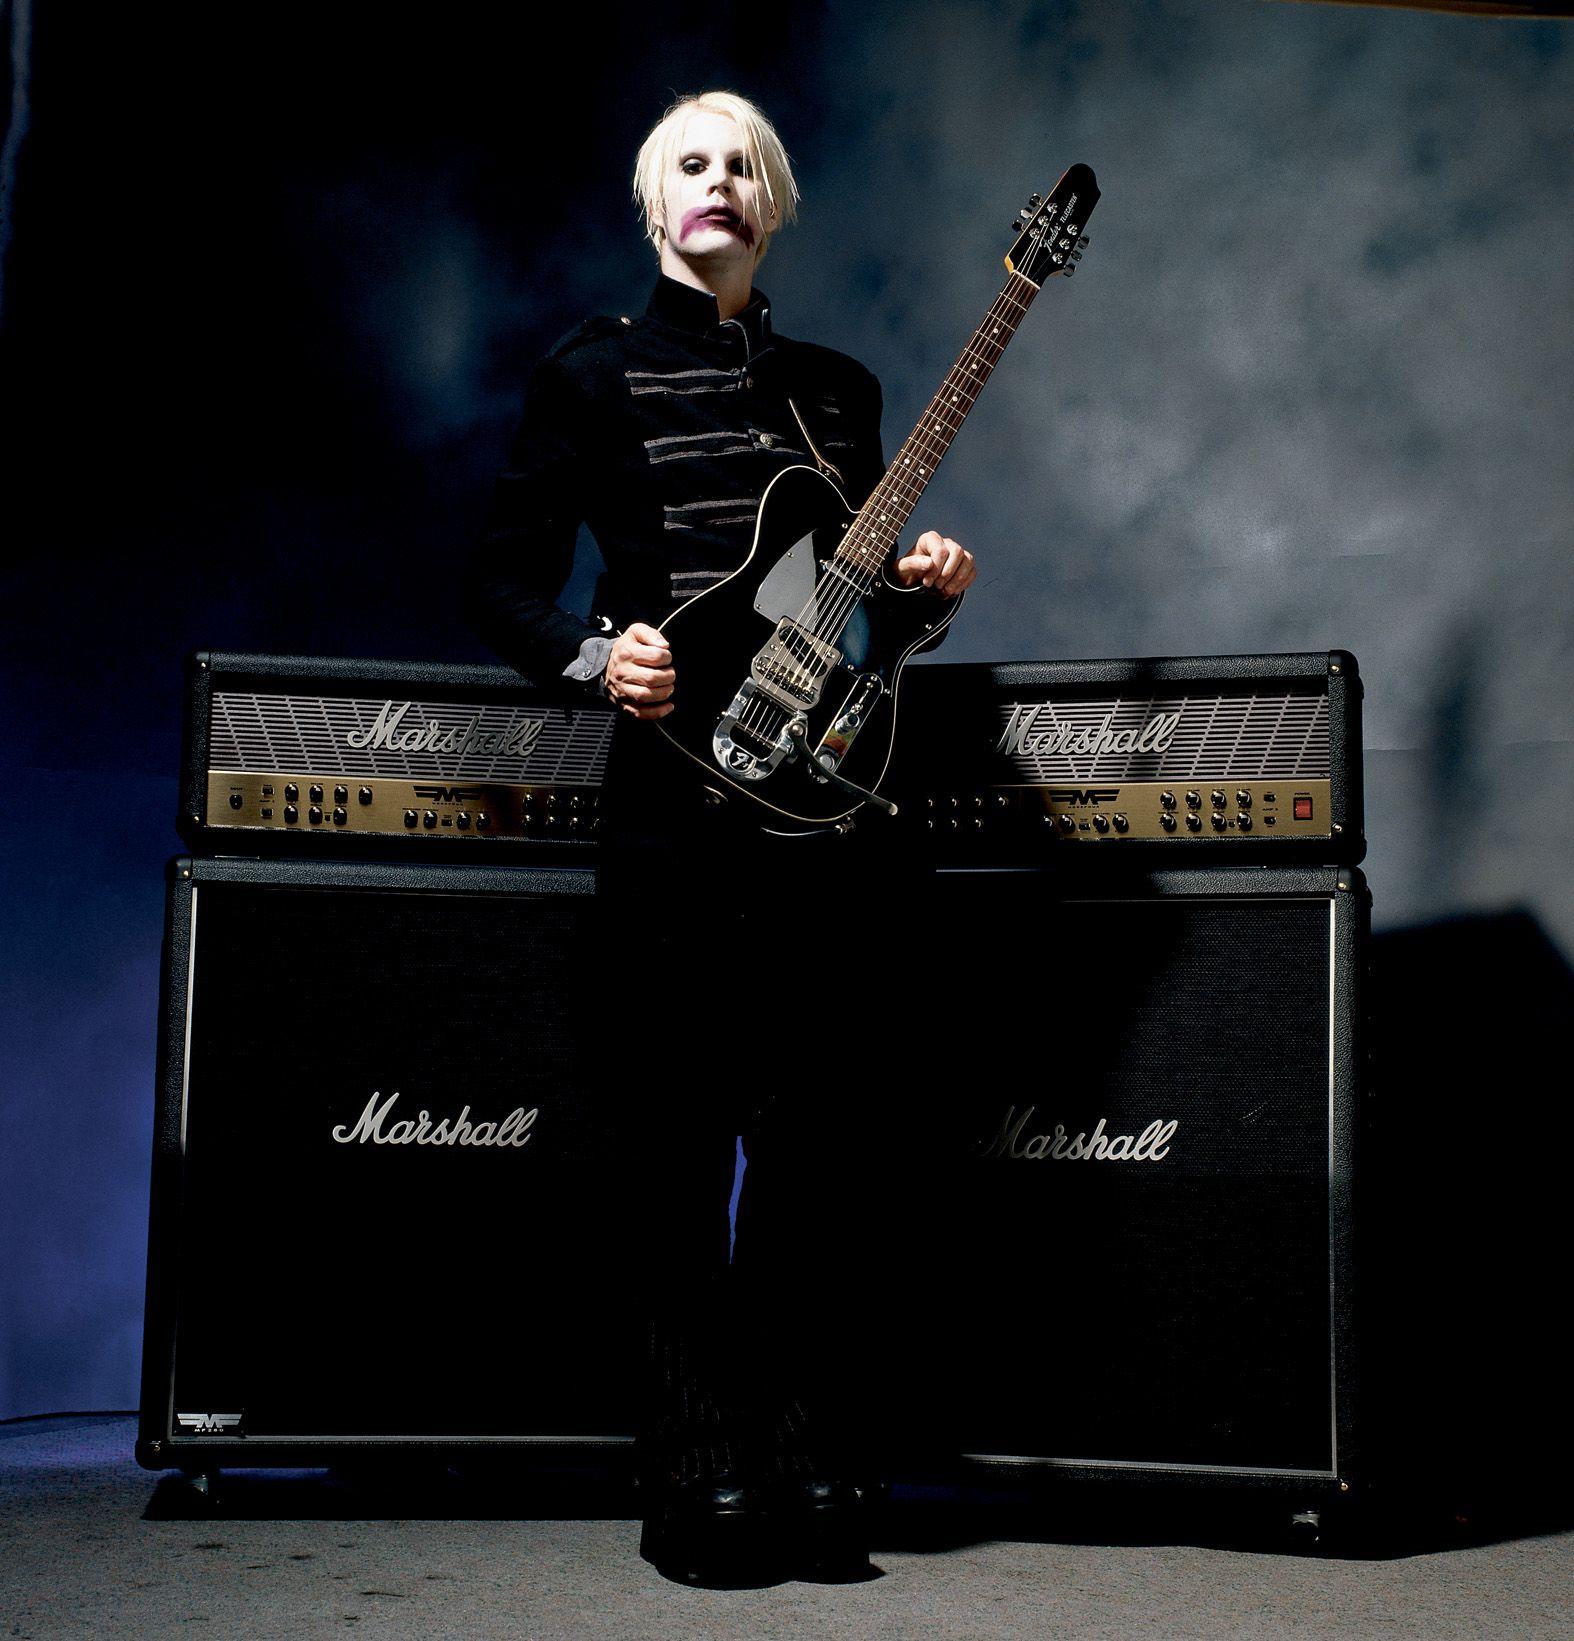 John 5 Marilyn Manson Rob Zombie Play That Funky Music Best Guitarist John 5